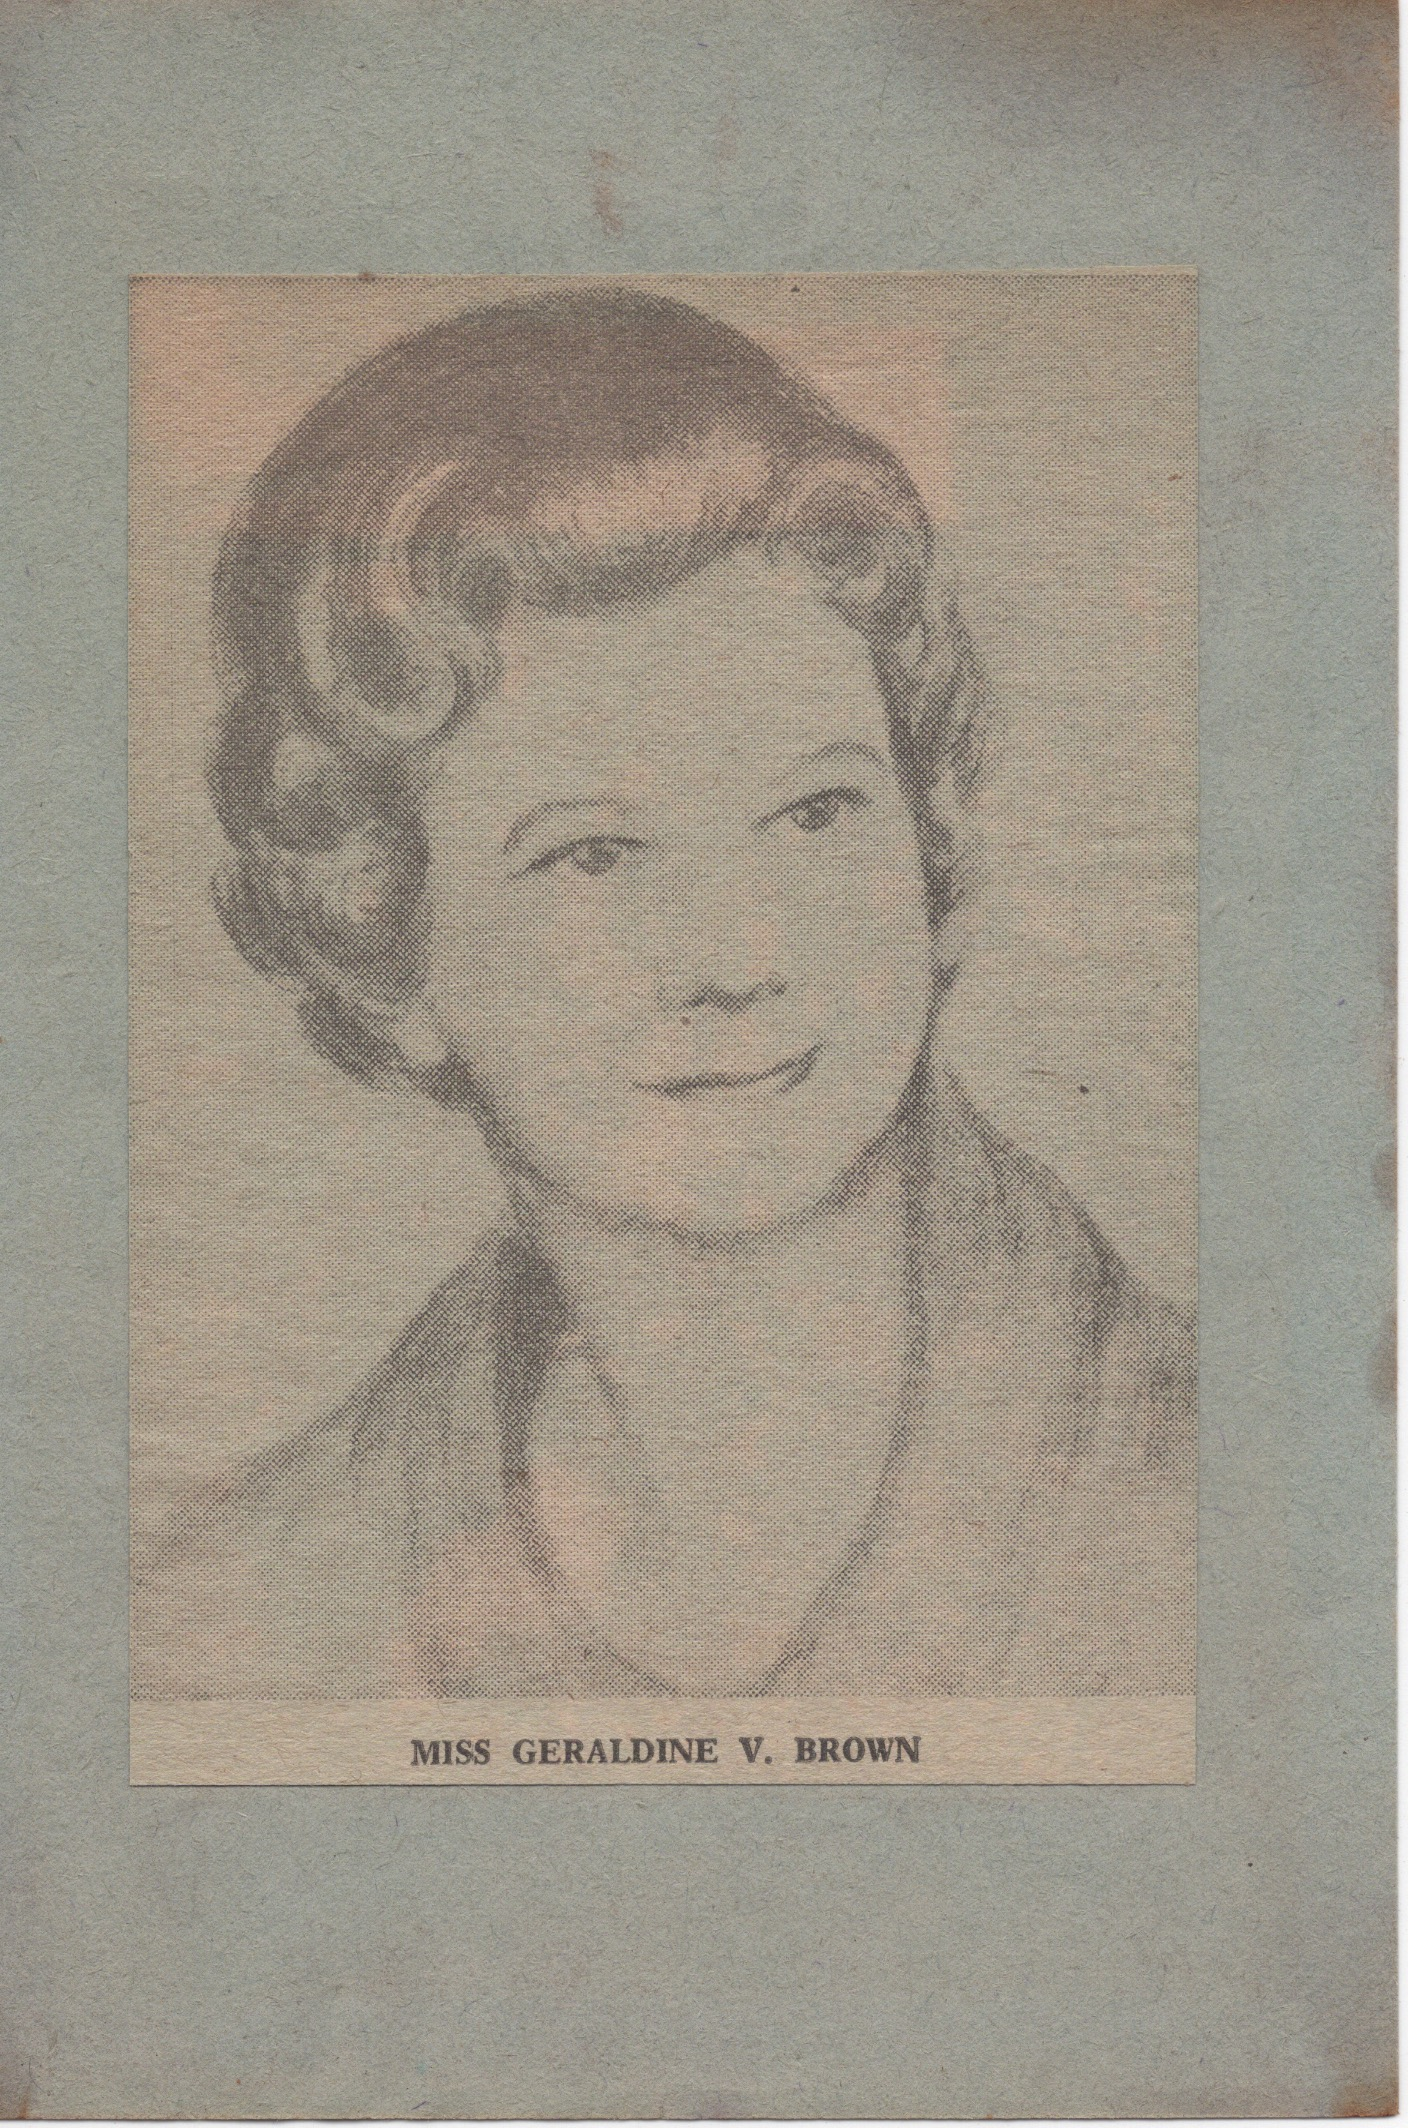 Geraldine V. Brown